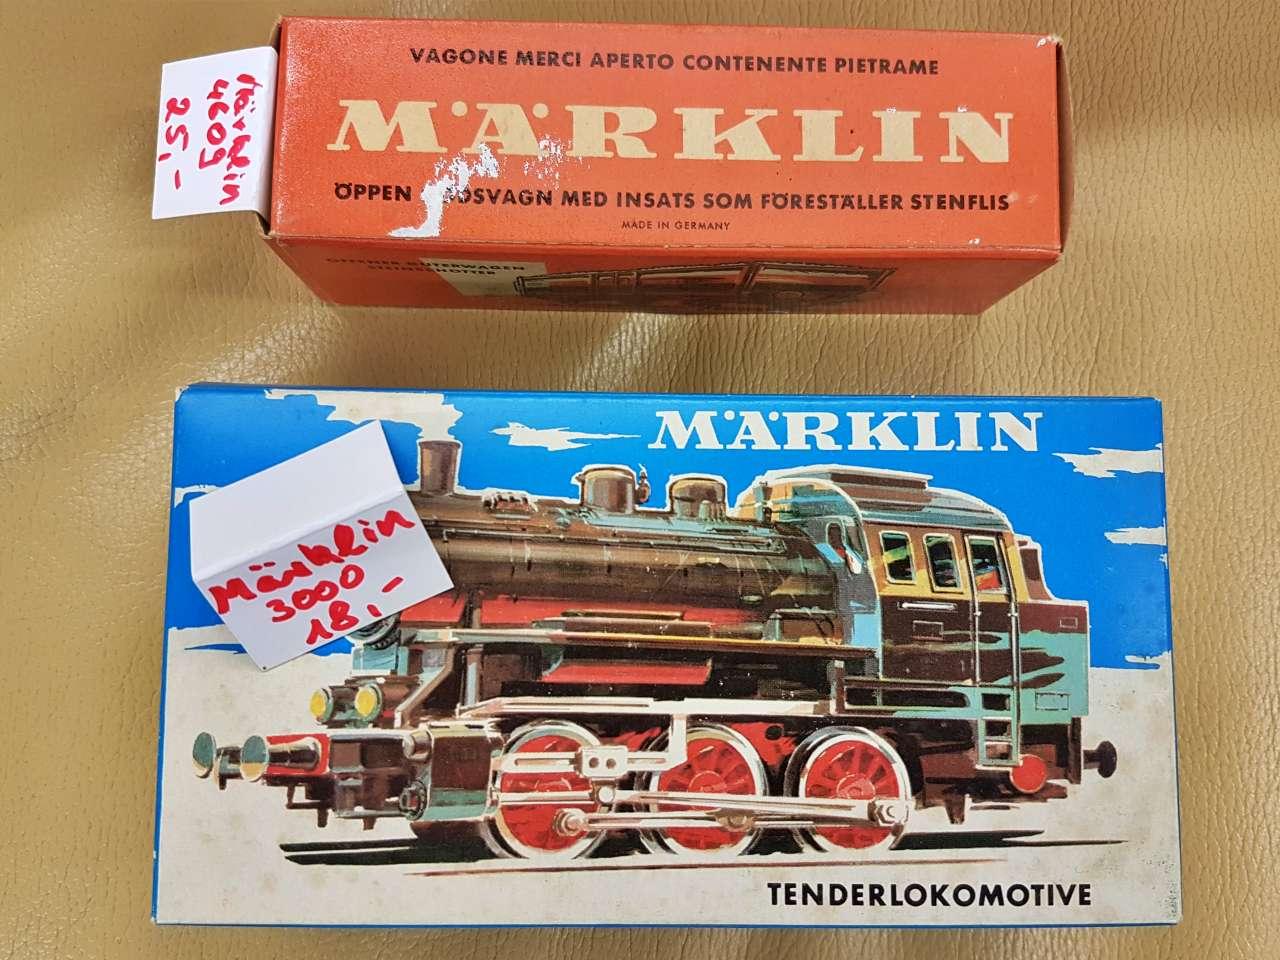 Märklin Modelleisenbahn Sammlerstücke neuwertig Lok 4609 und 3000